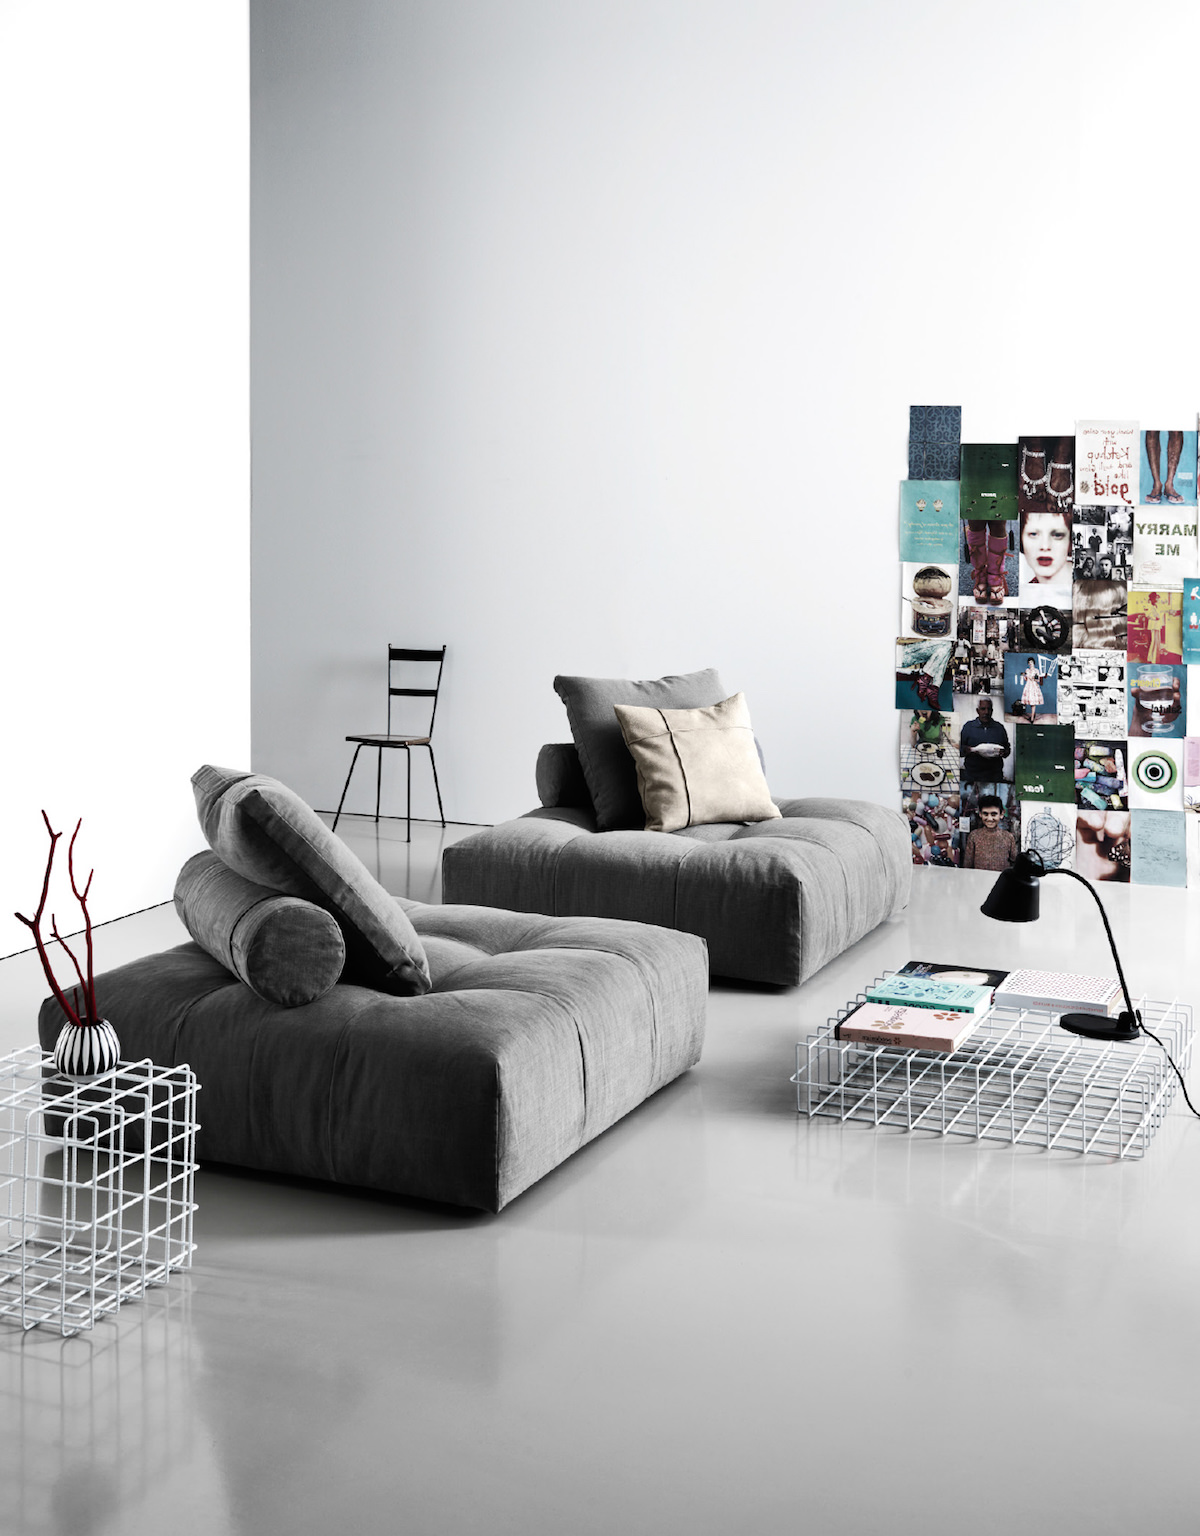 Divani relax design saba italia pixel 9 rafaschieri for Divani design italia